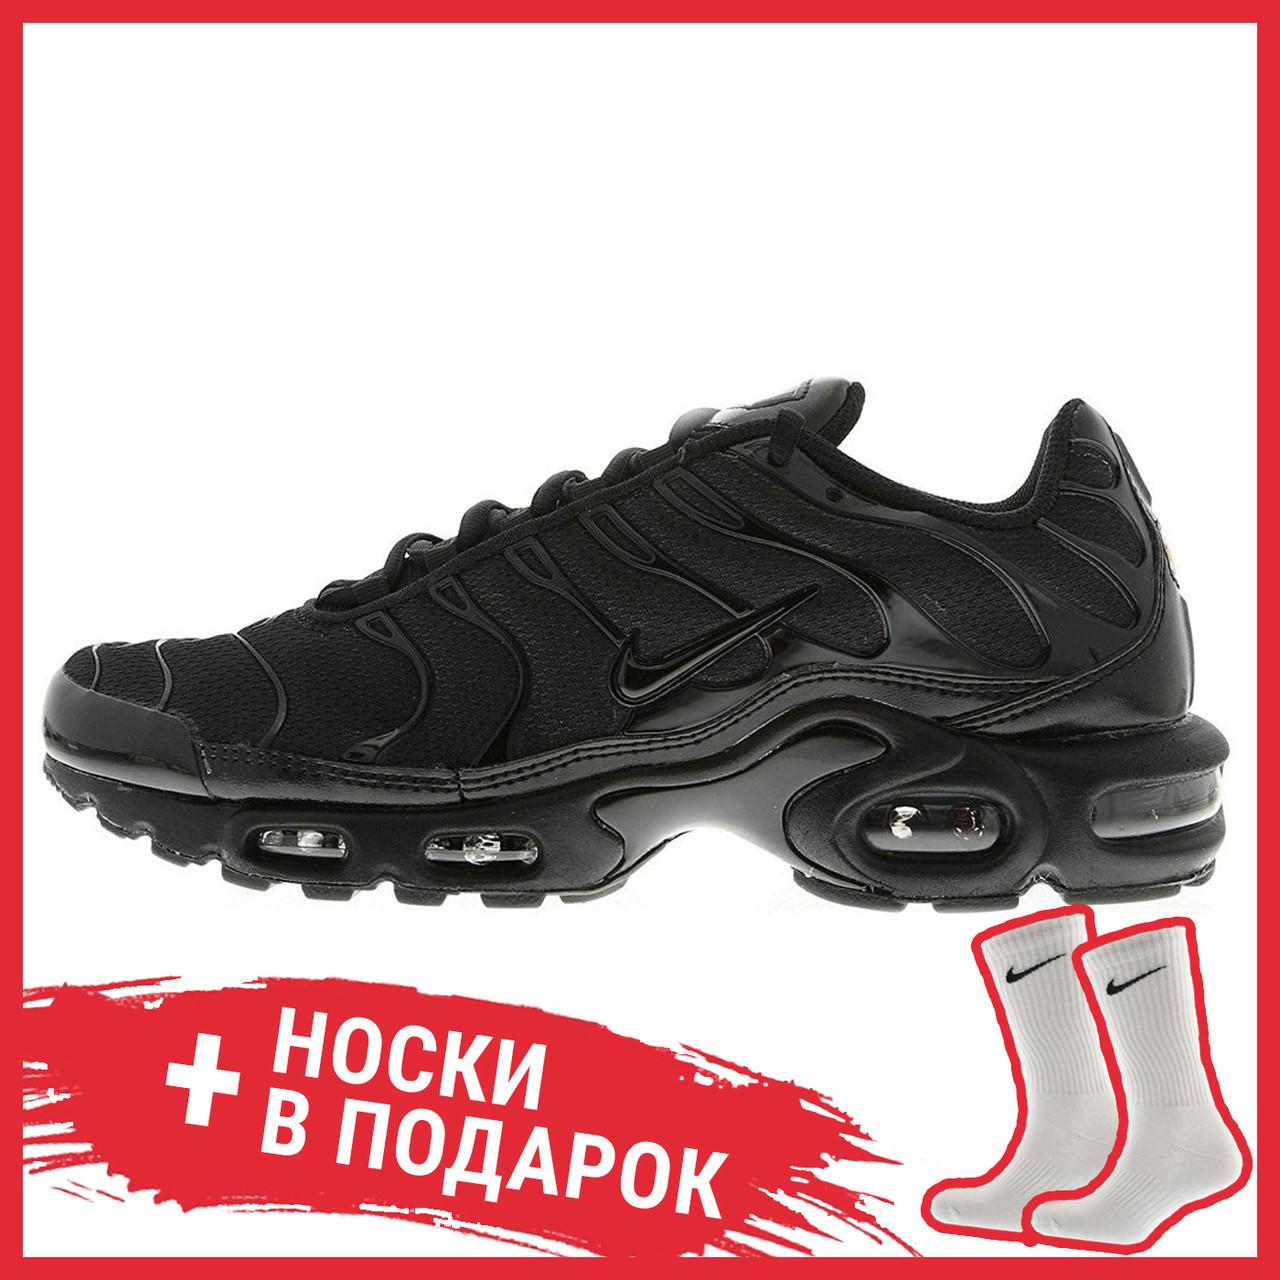 Мужские кроссовки Nike TN Air Max Plus Triple Black 604133-050, Найк Аир Макс ТН